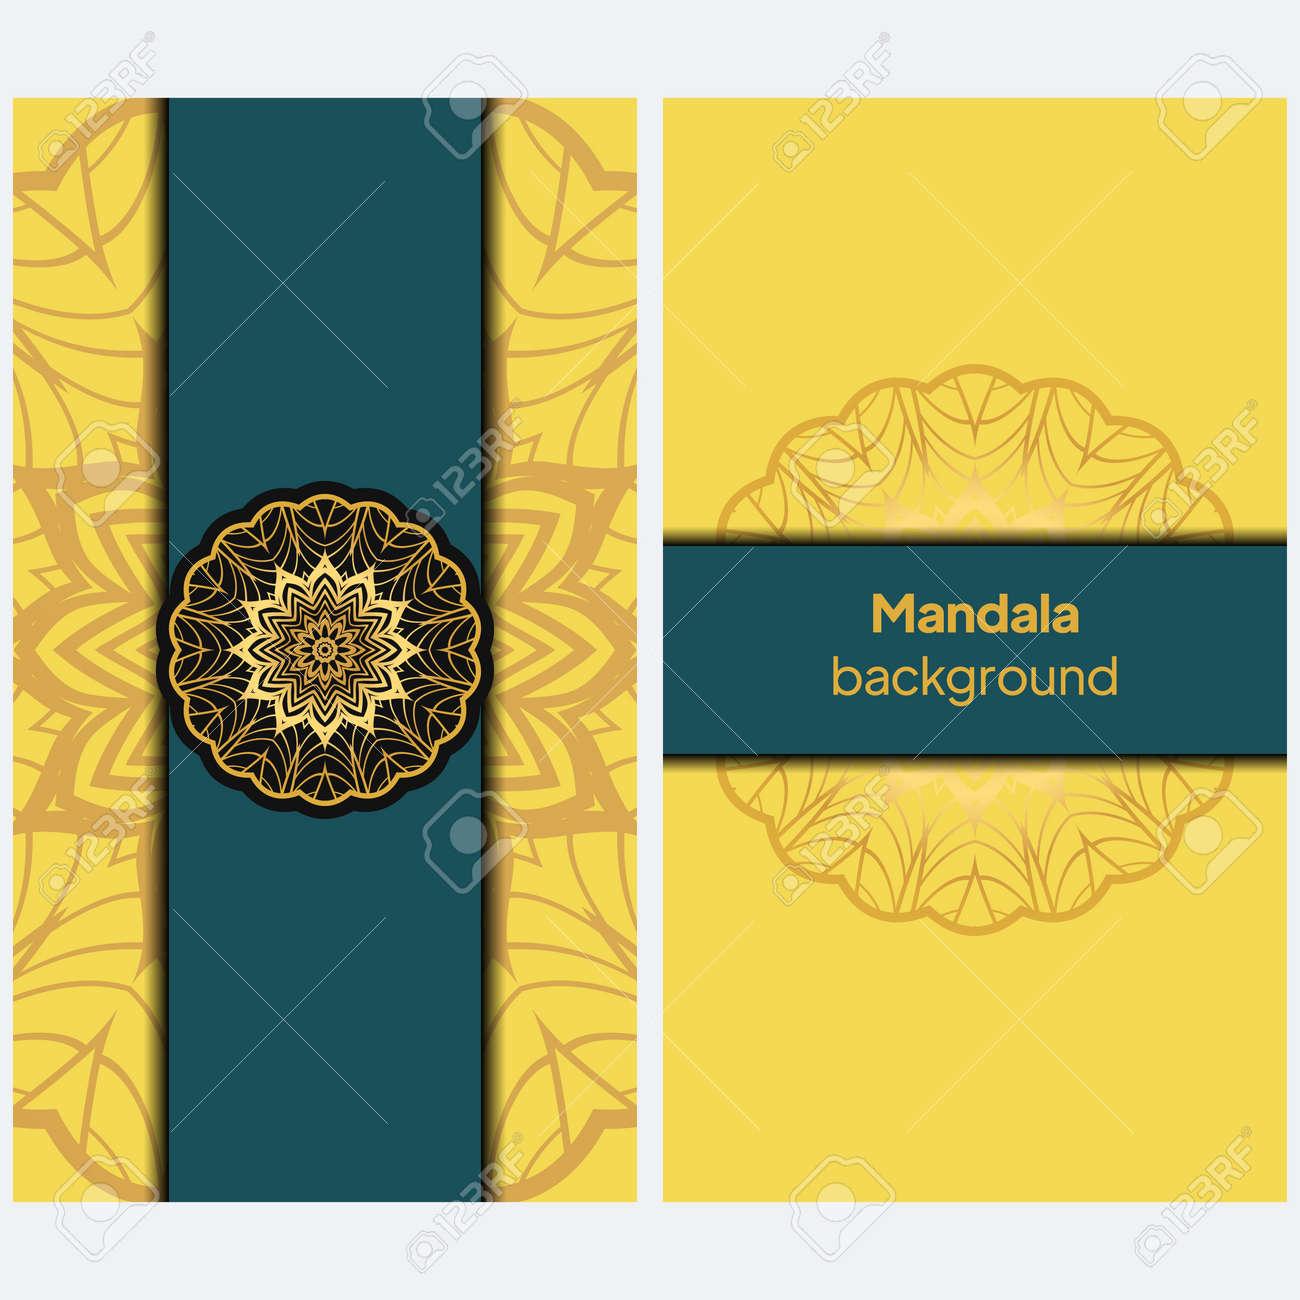 Ethnic Mandala ornament. Templates with mandalas. Vector illustration for congratulation or invitation. - 167230528